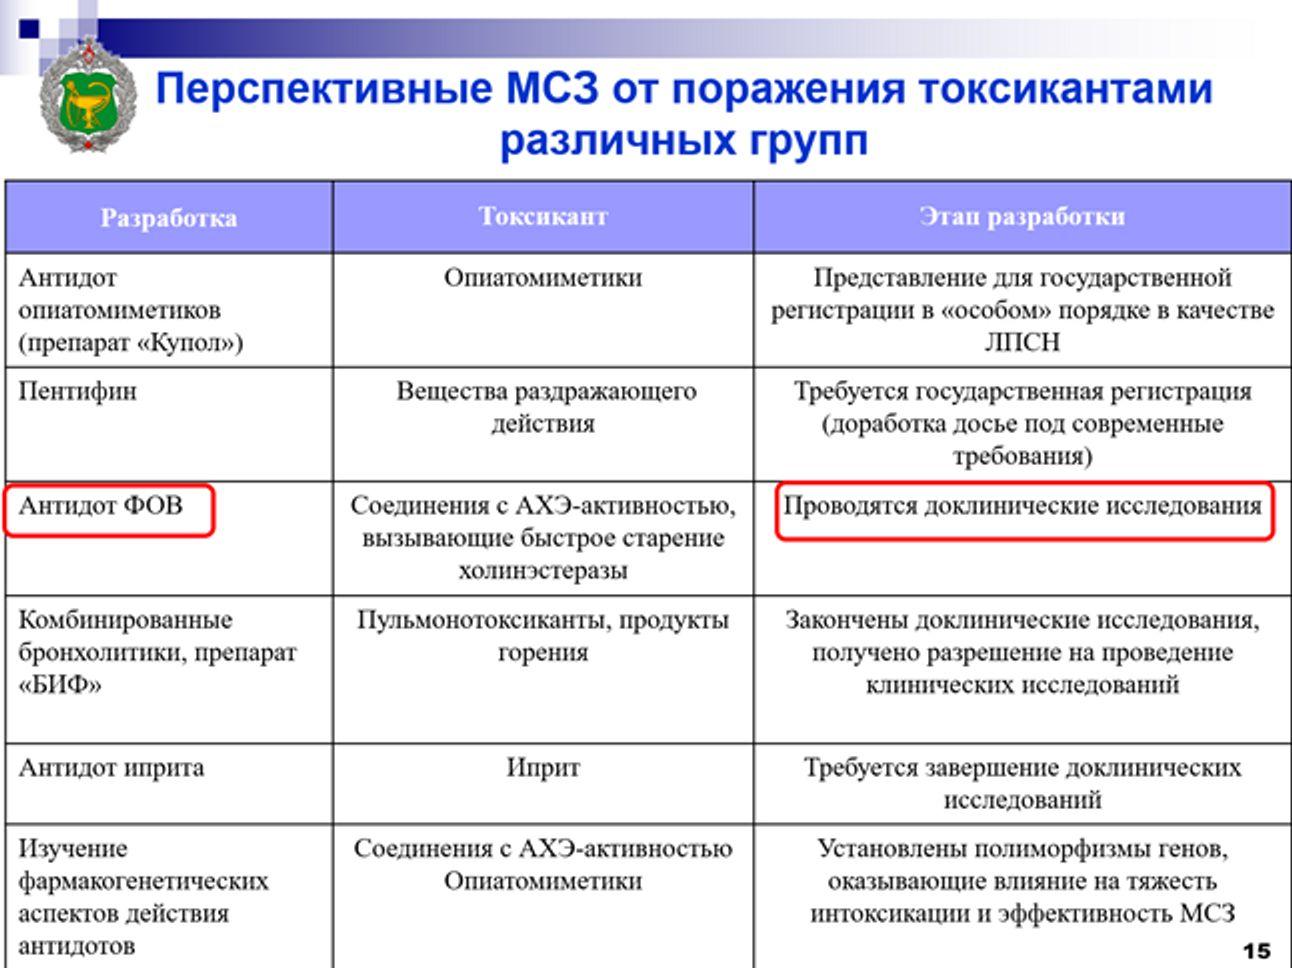 MS5wbmc.jpg